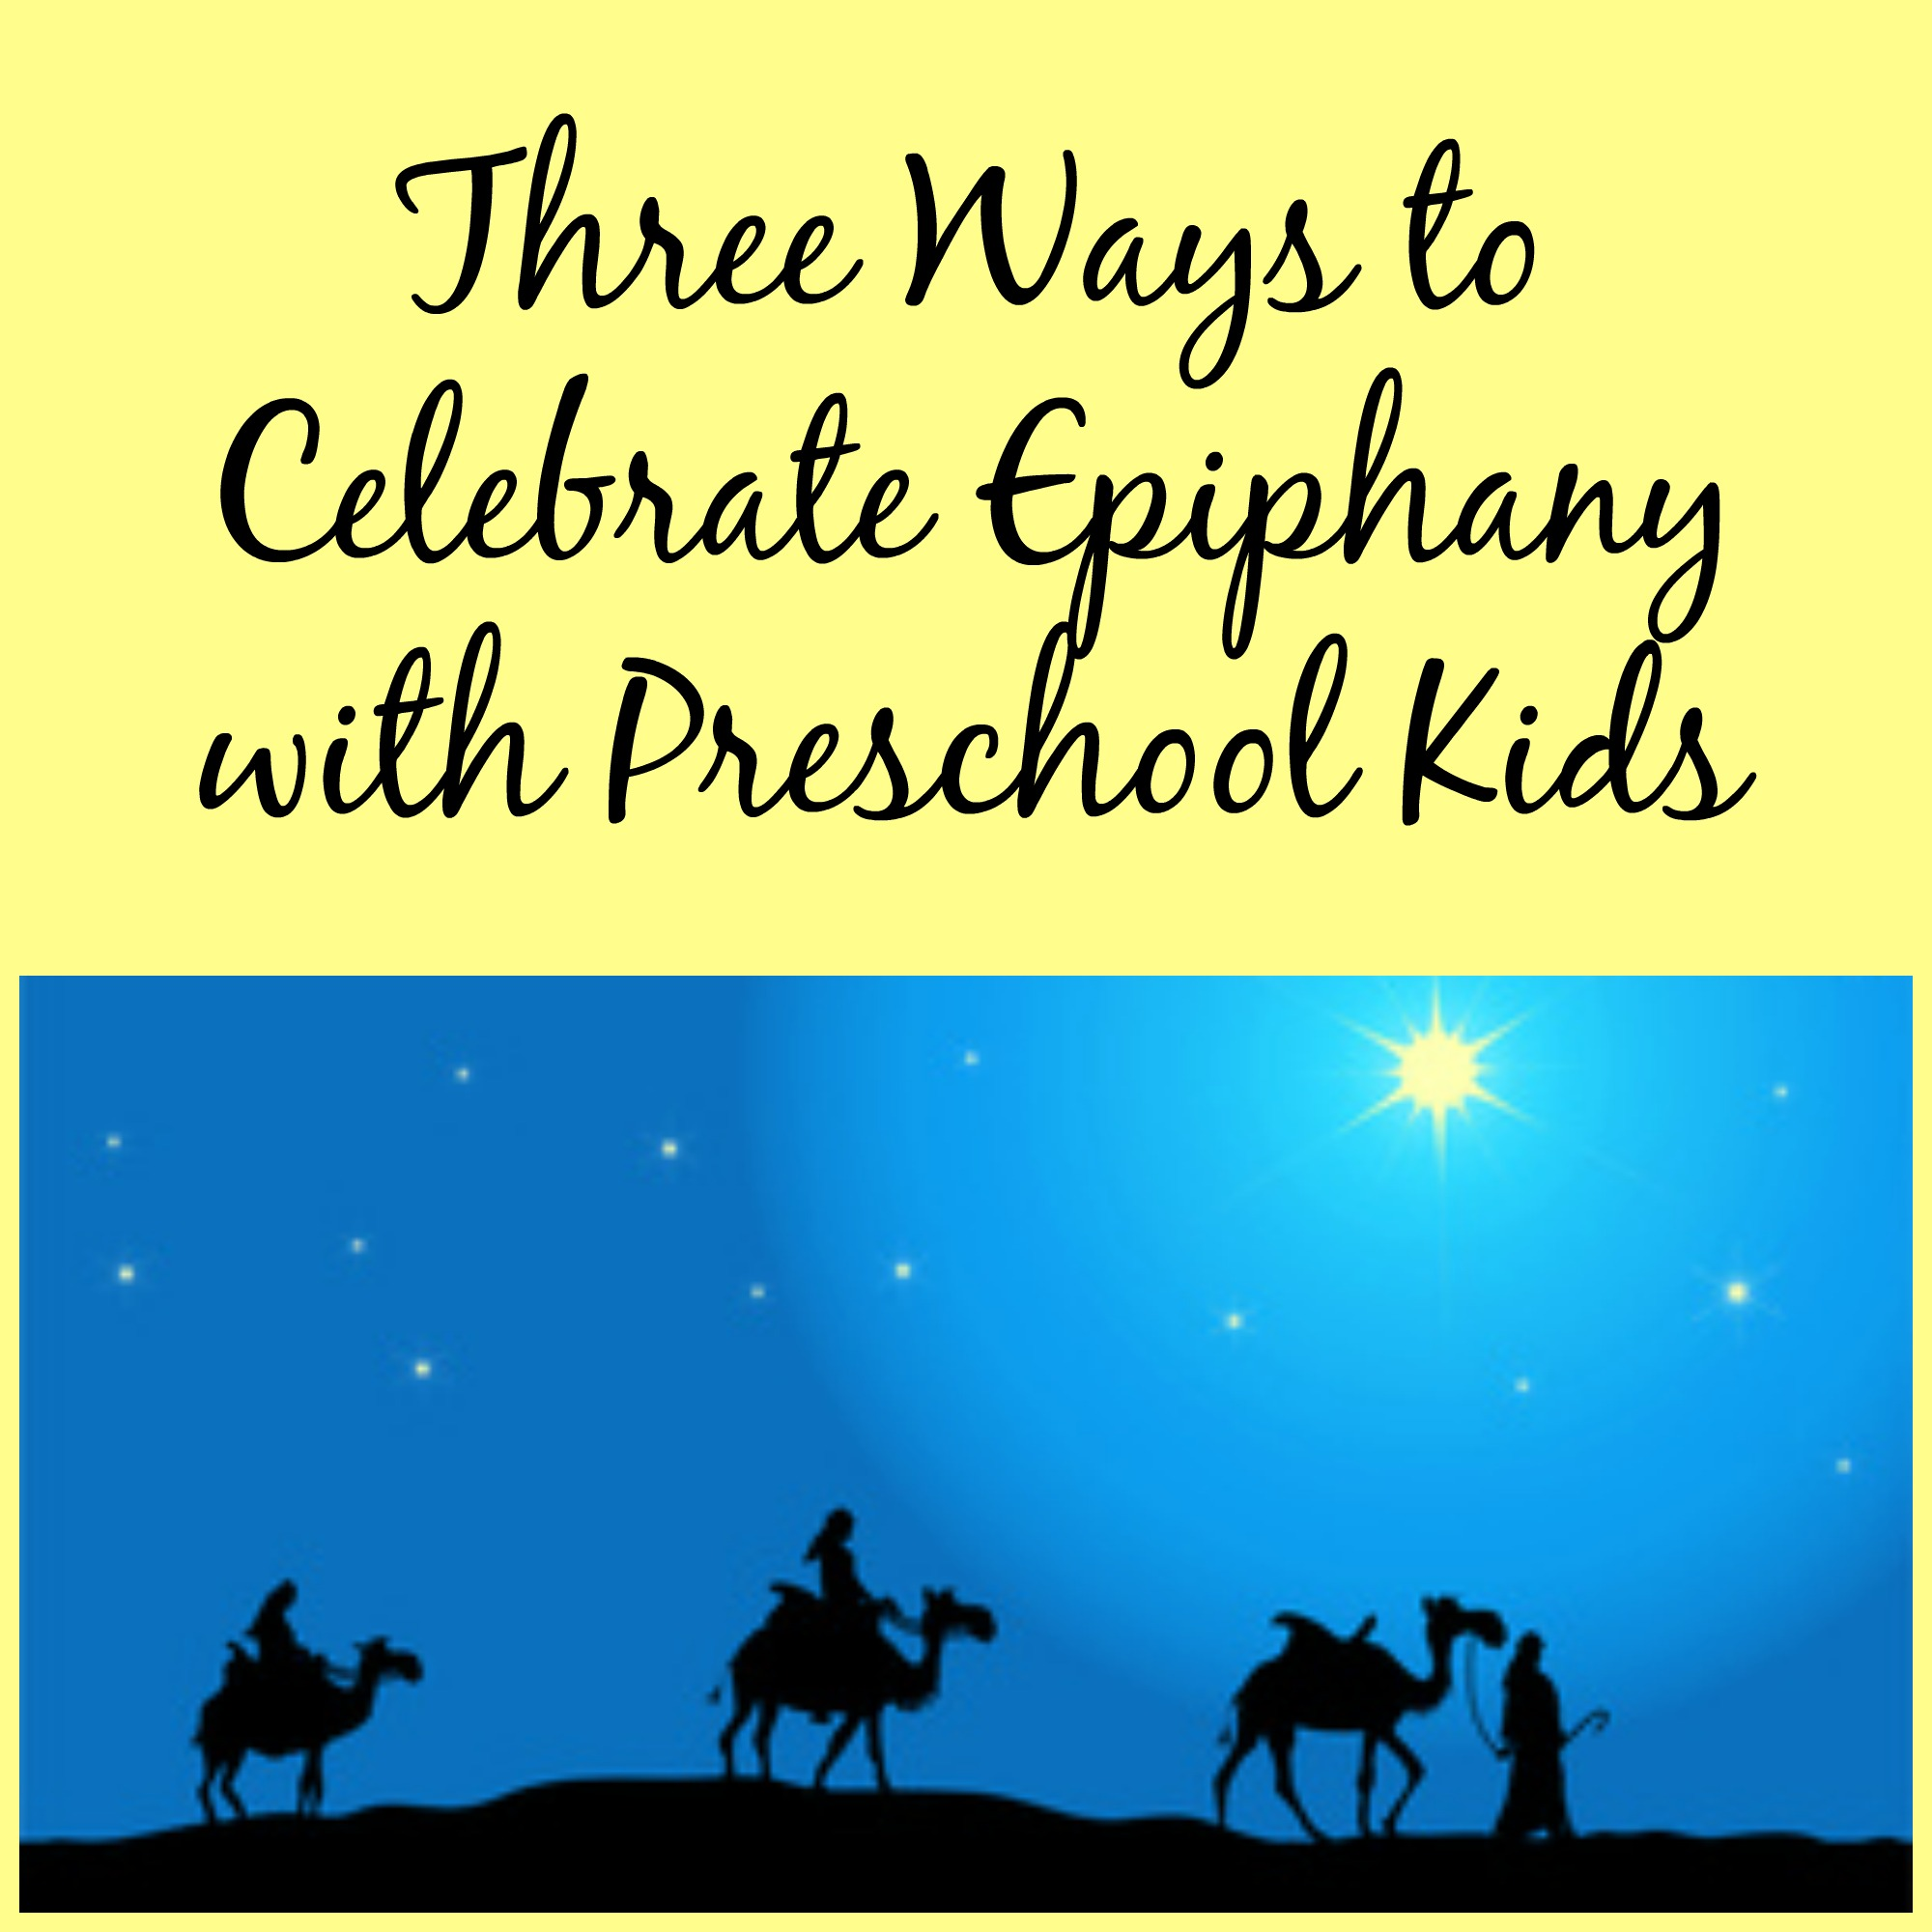 Three Ways To Celebrate Epiphany